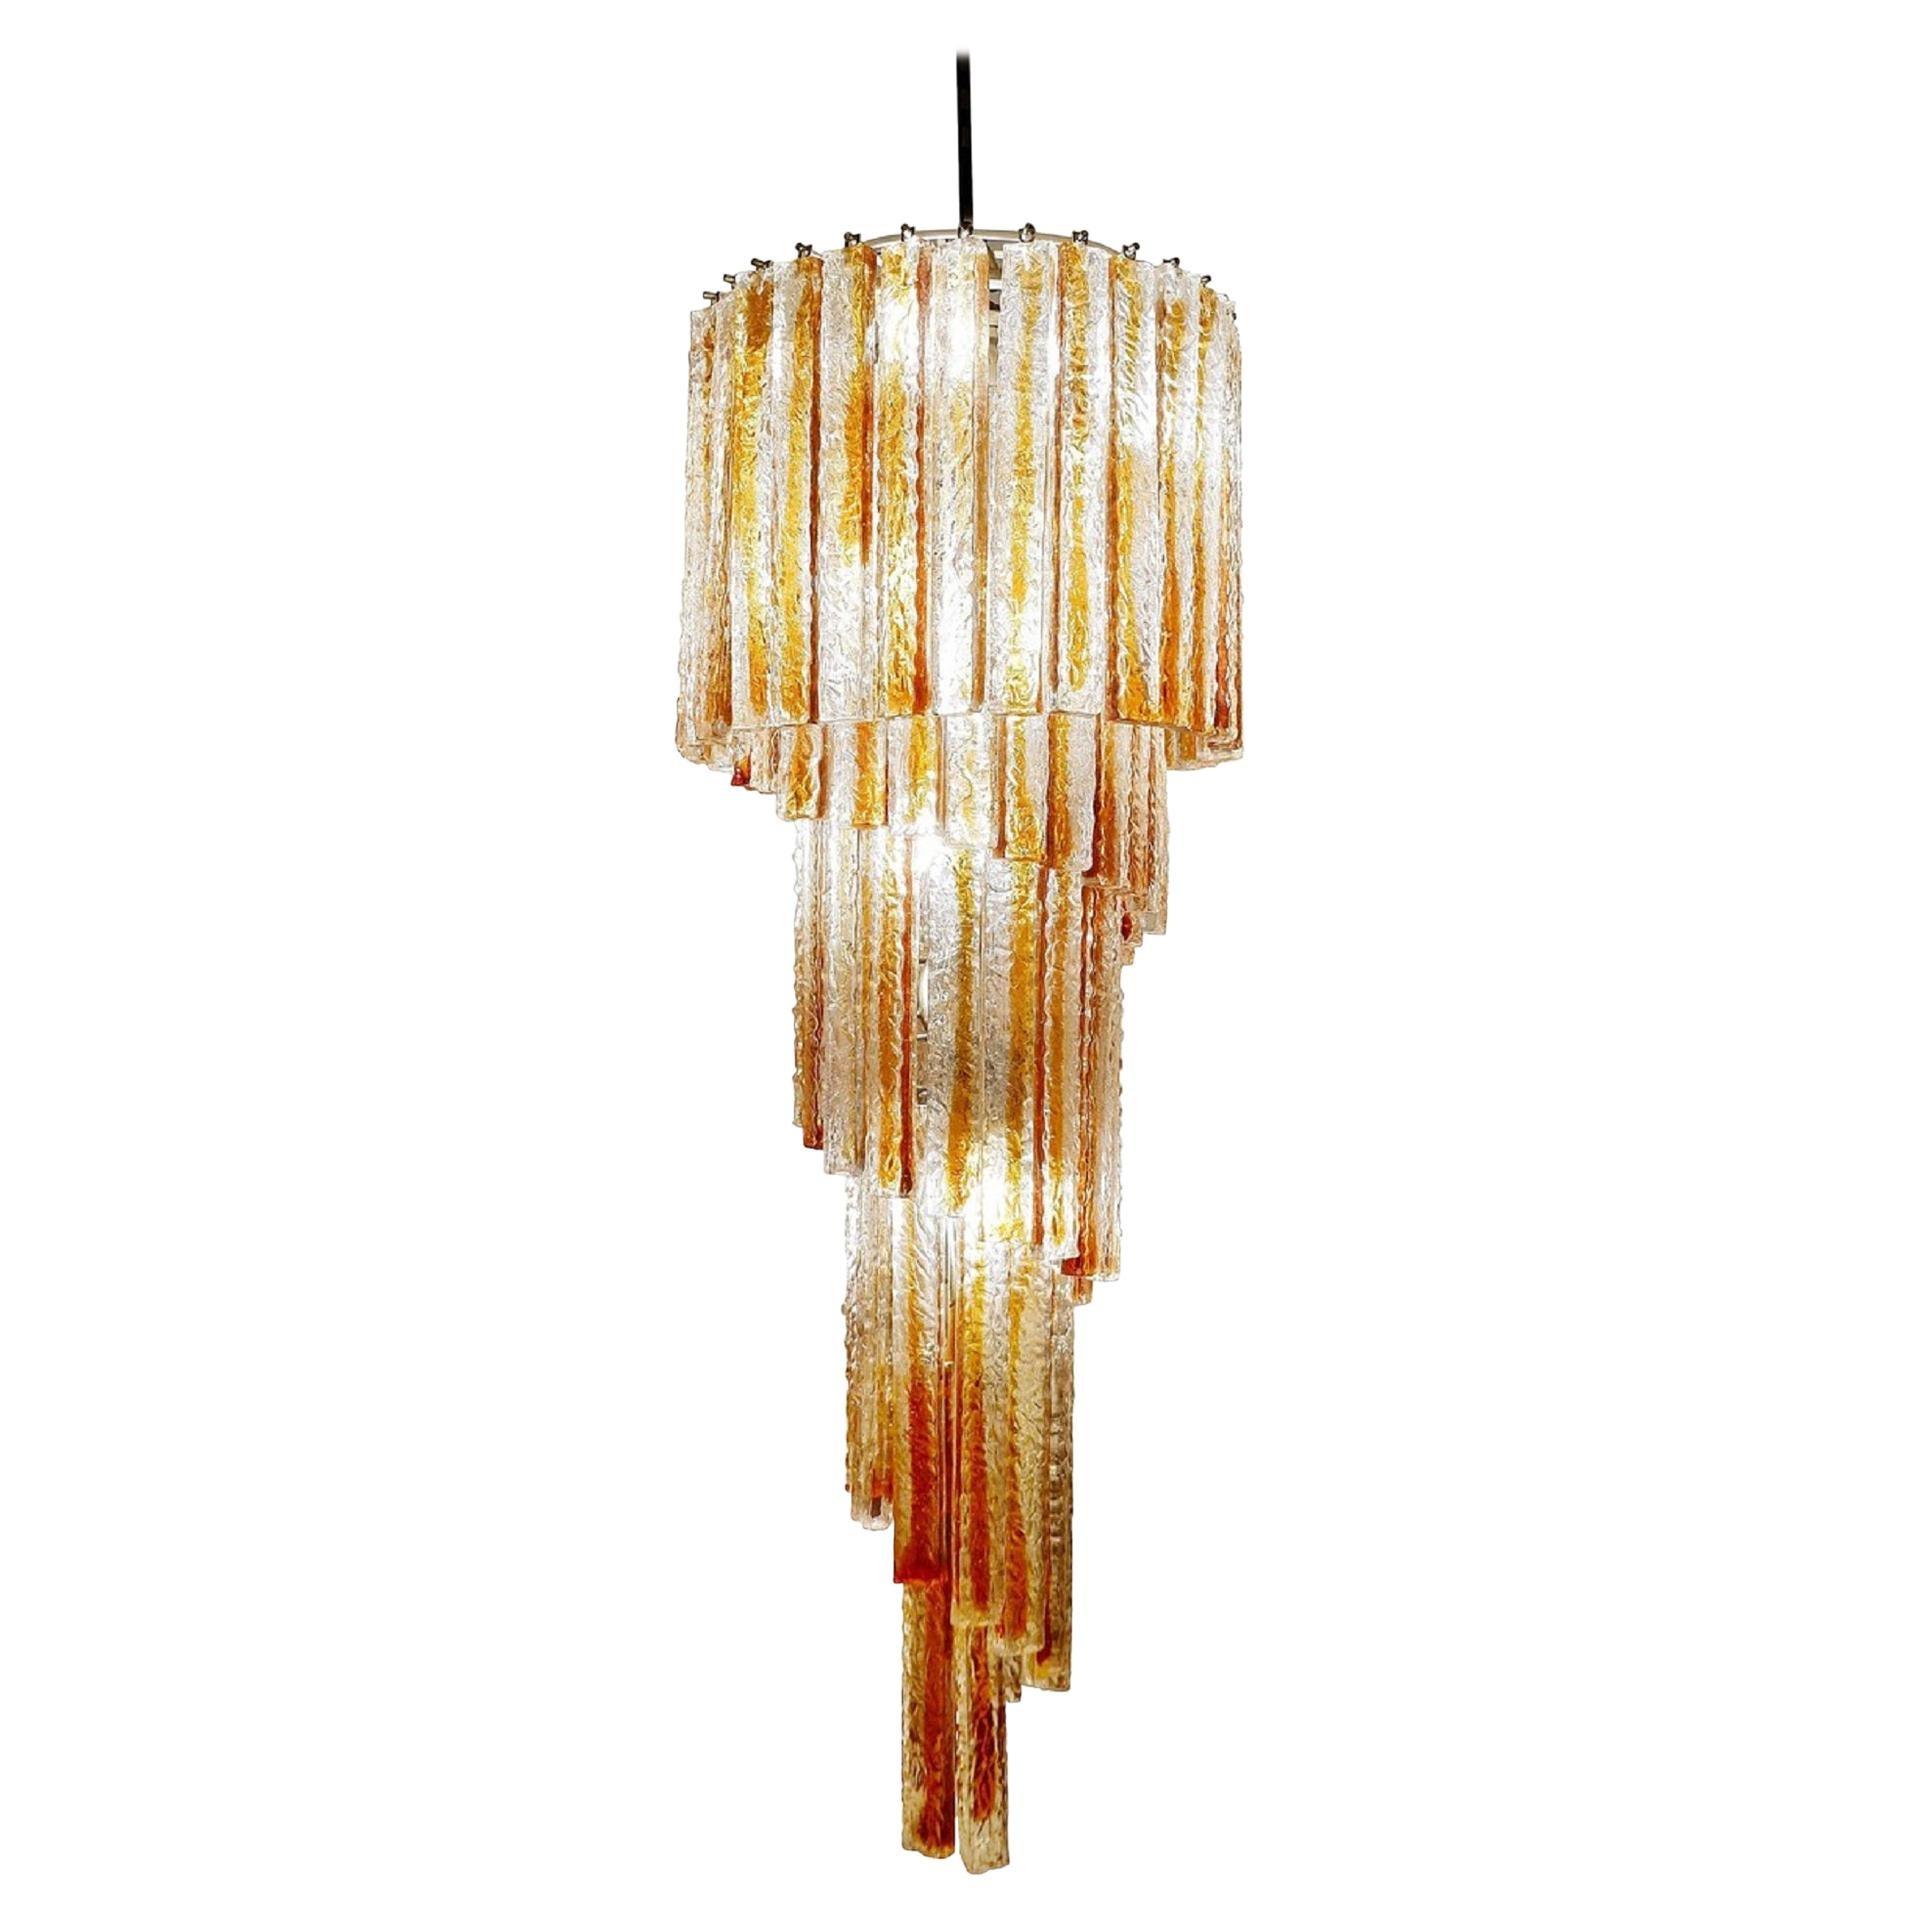 Spiral Murano Glass Chandelier by Venini